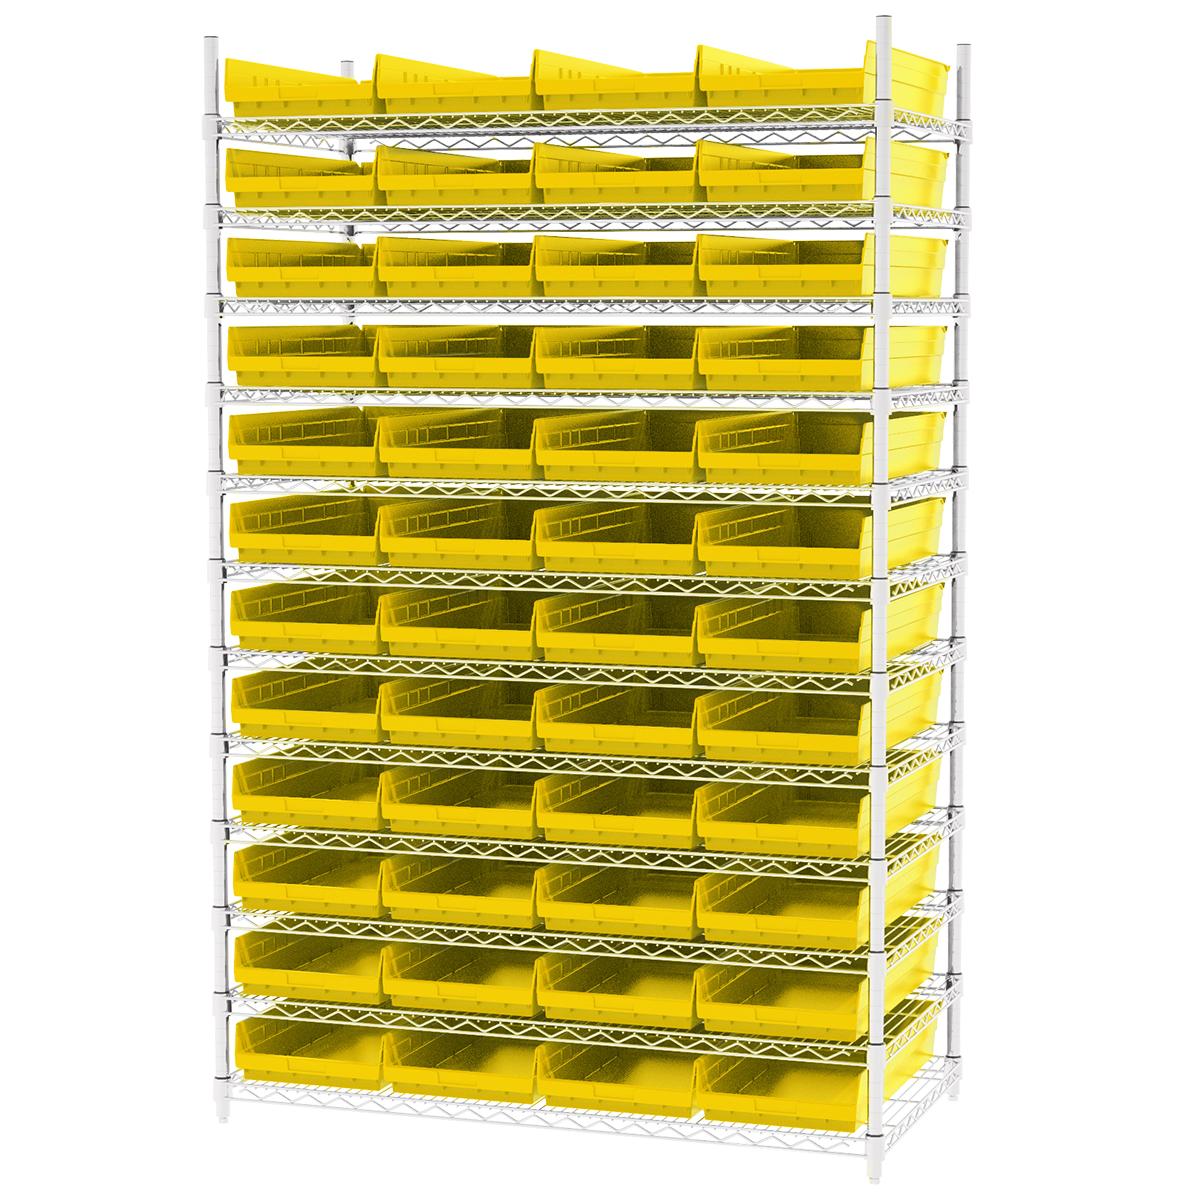 Stackable Storage Bin Racks Pick Rack Systems Wire